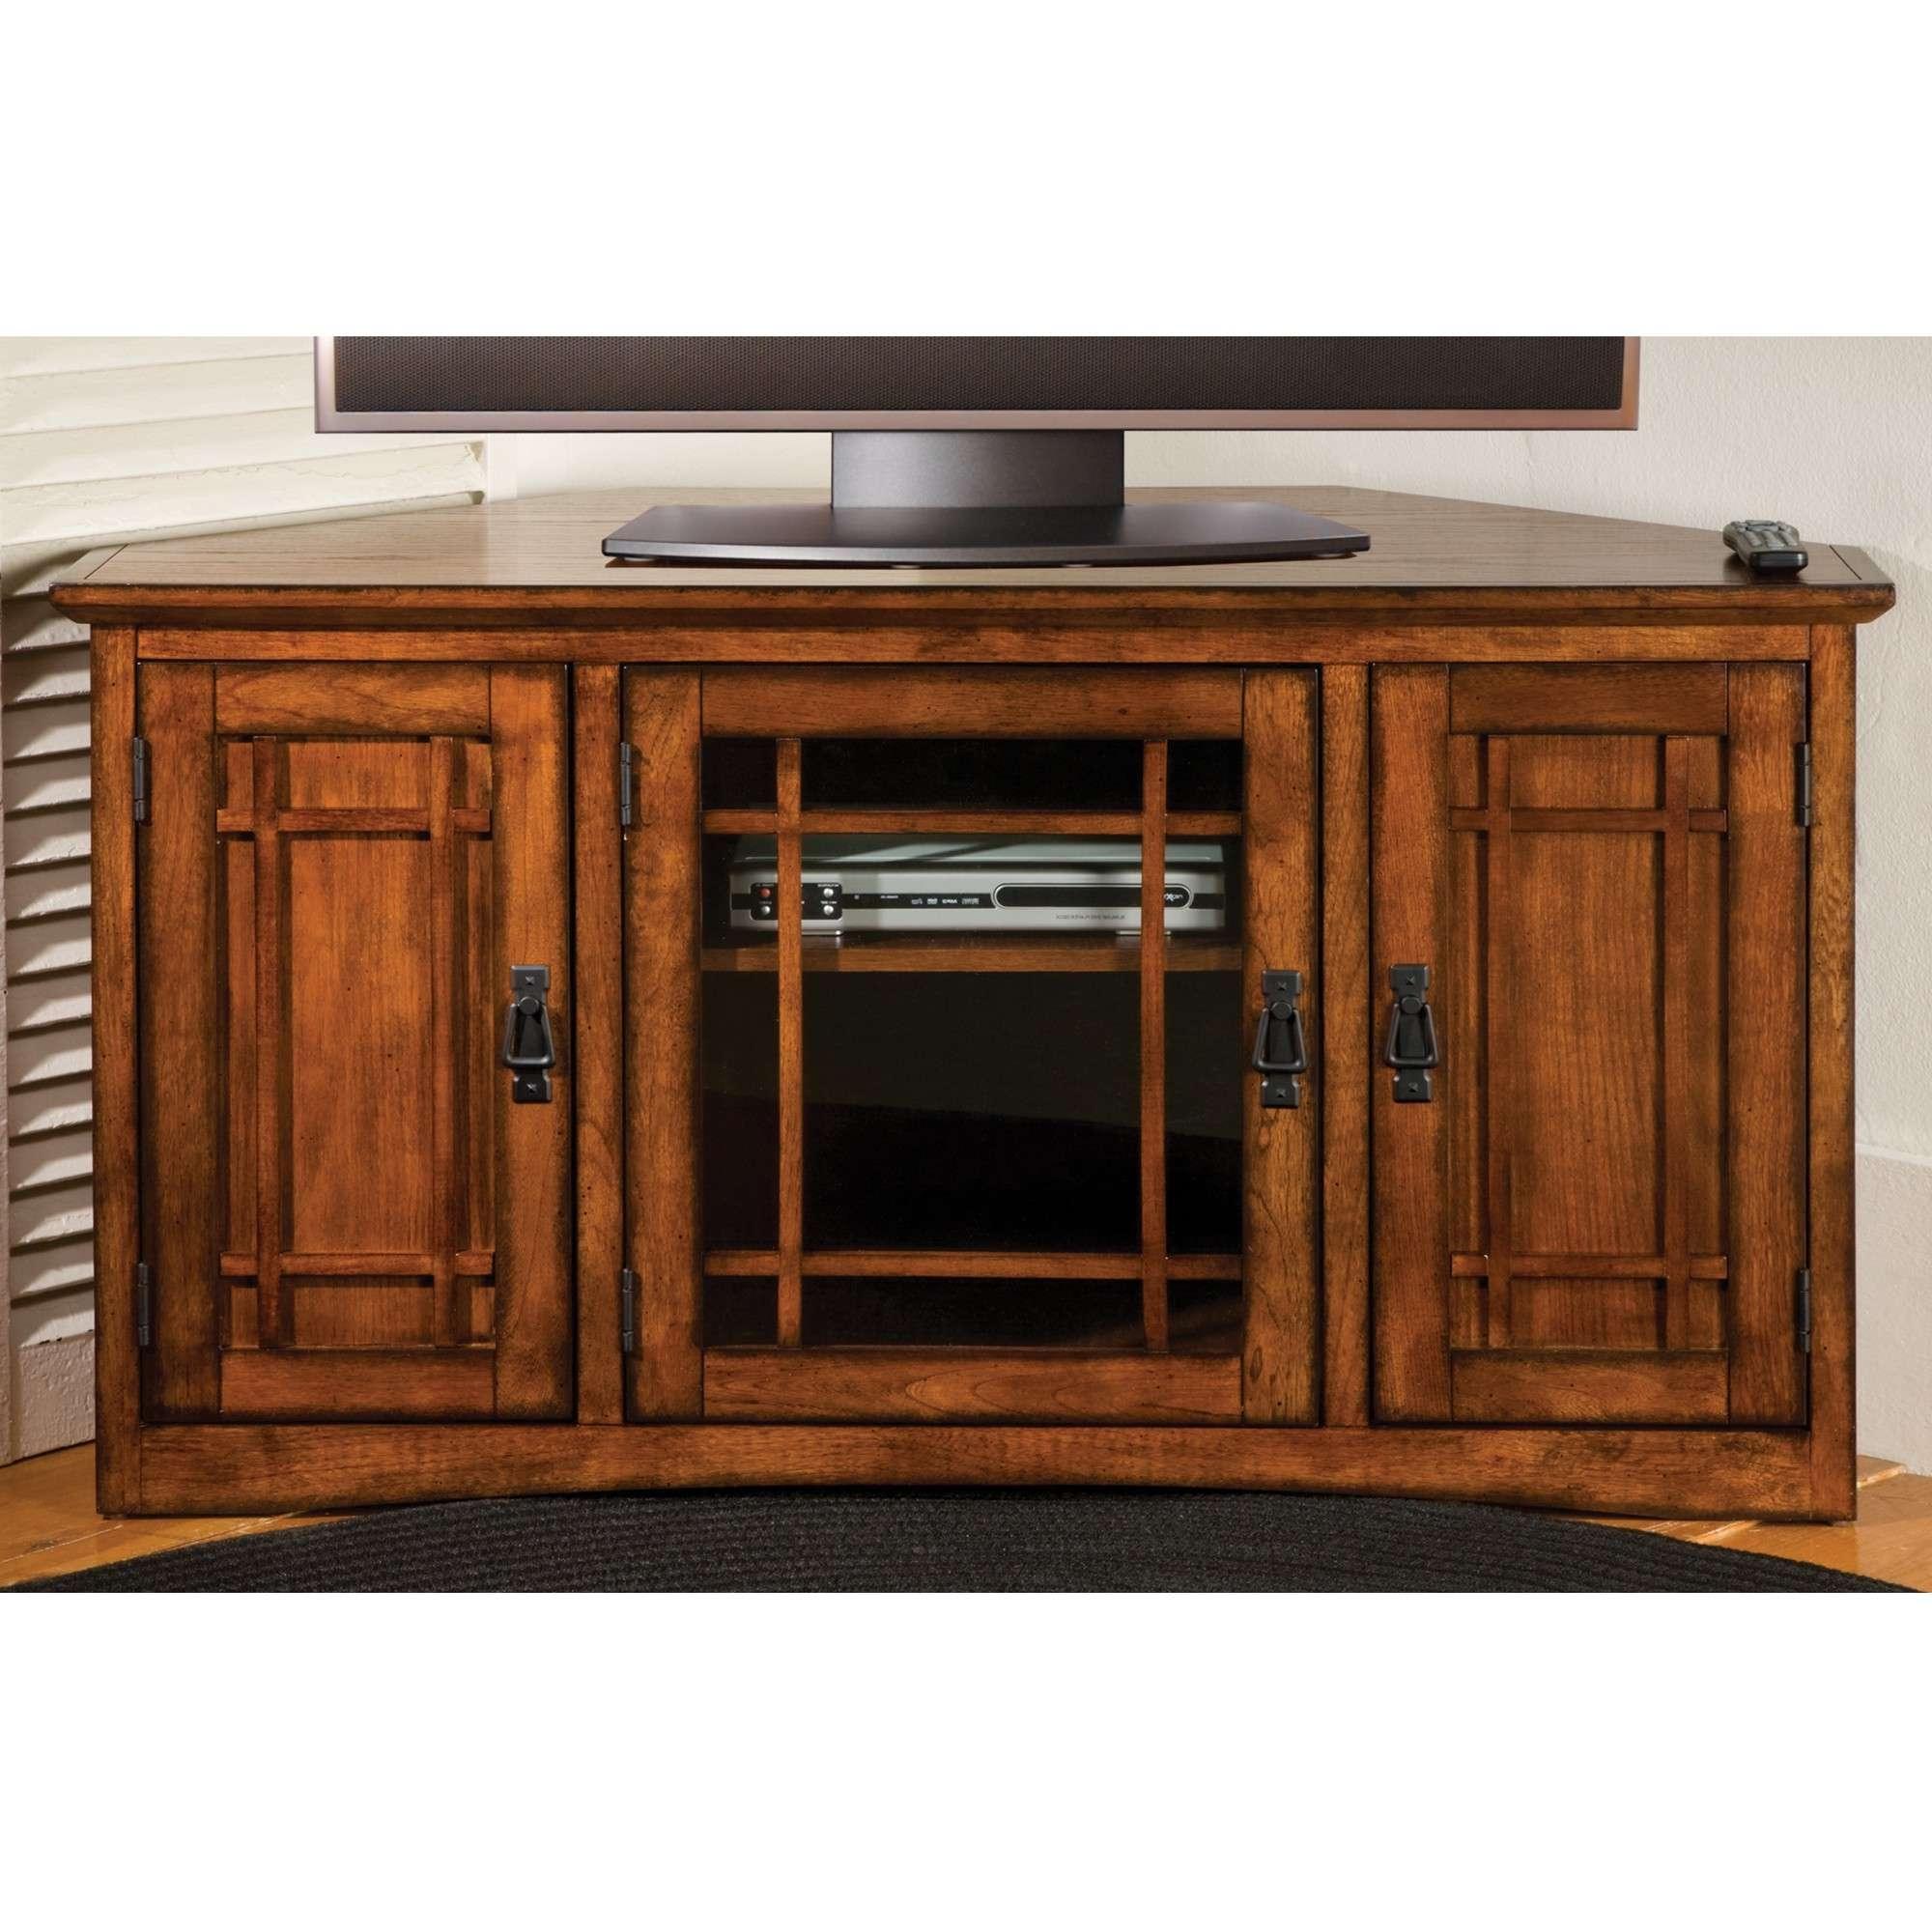 Mission Corner Tv Cabinet | Sturbridge Yankee Workshop With Corner Tv Cabinets (View 20 of 20)